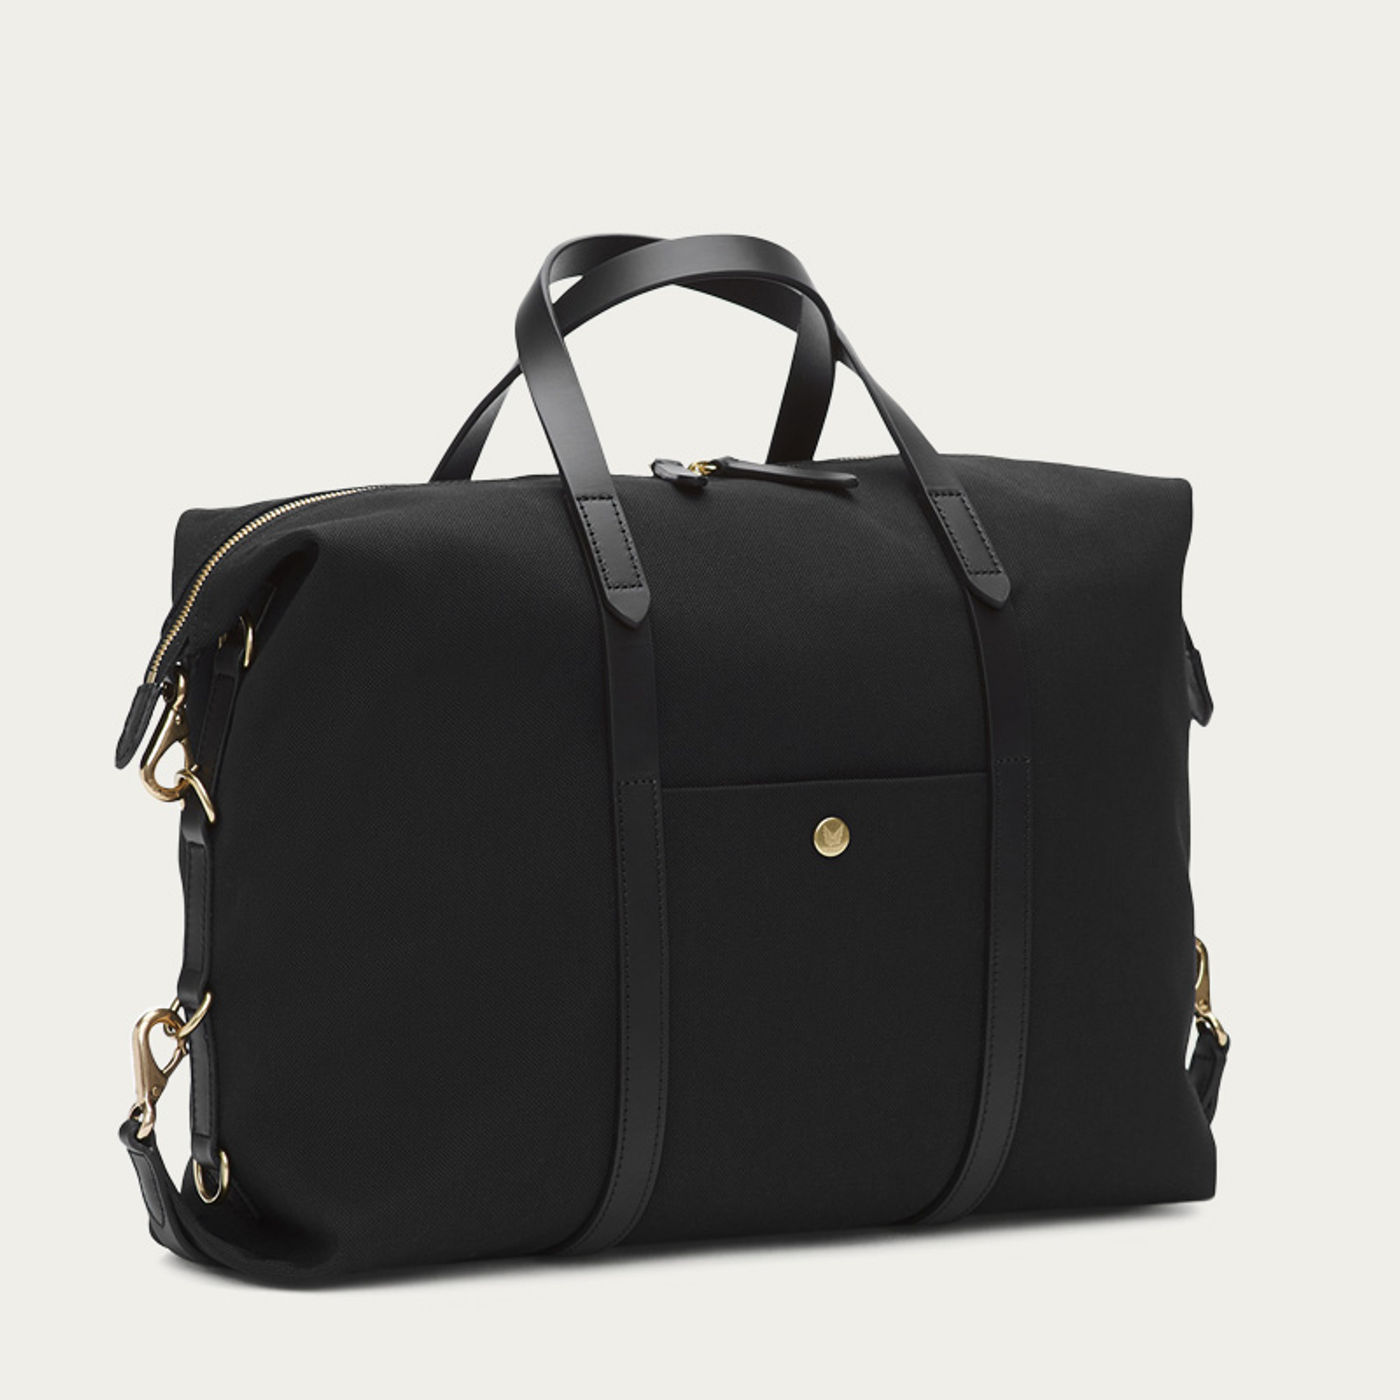 Coal/Black M/S Utility Duffle Bag | Bombinate